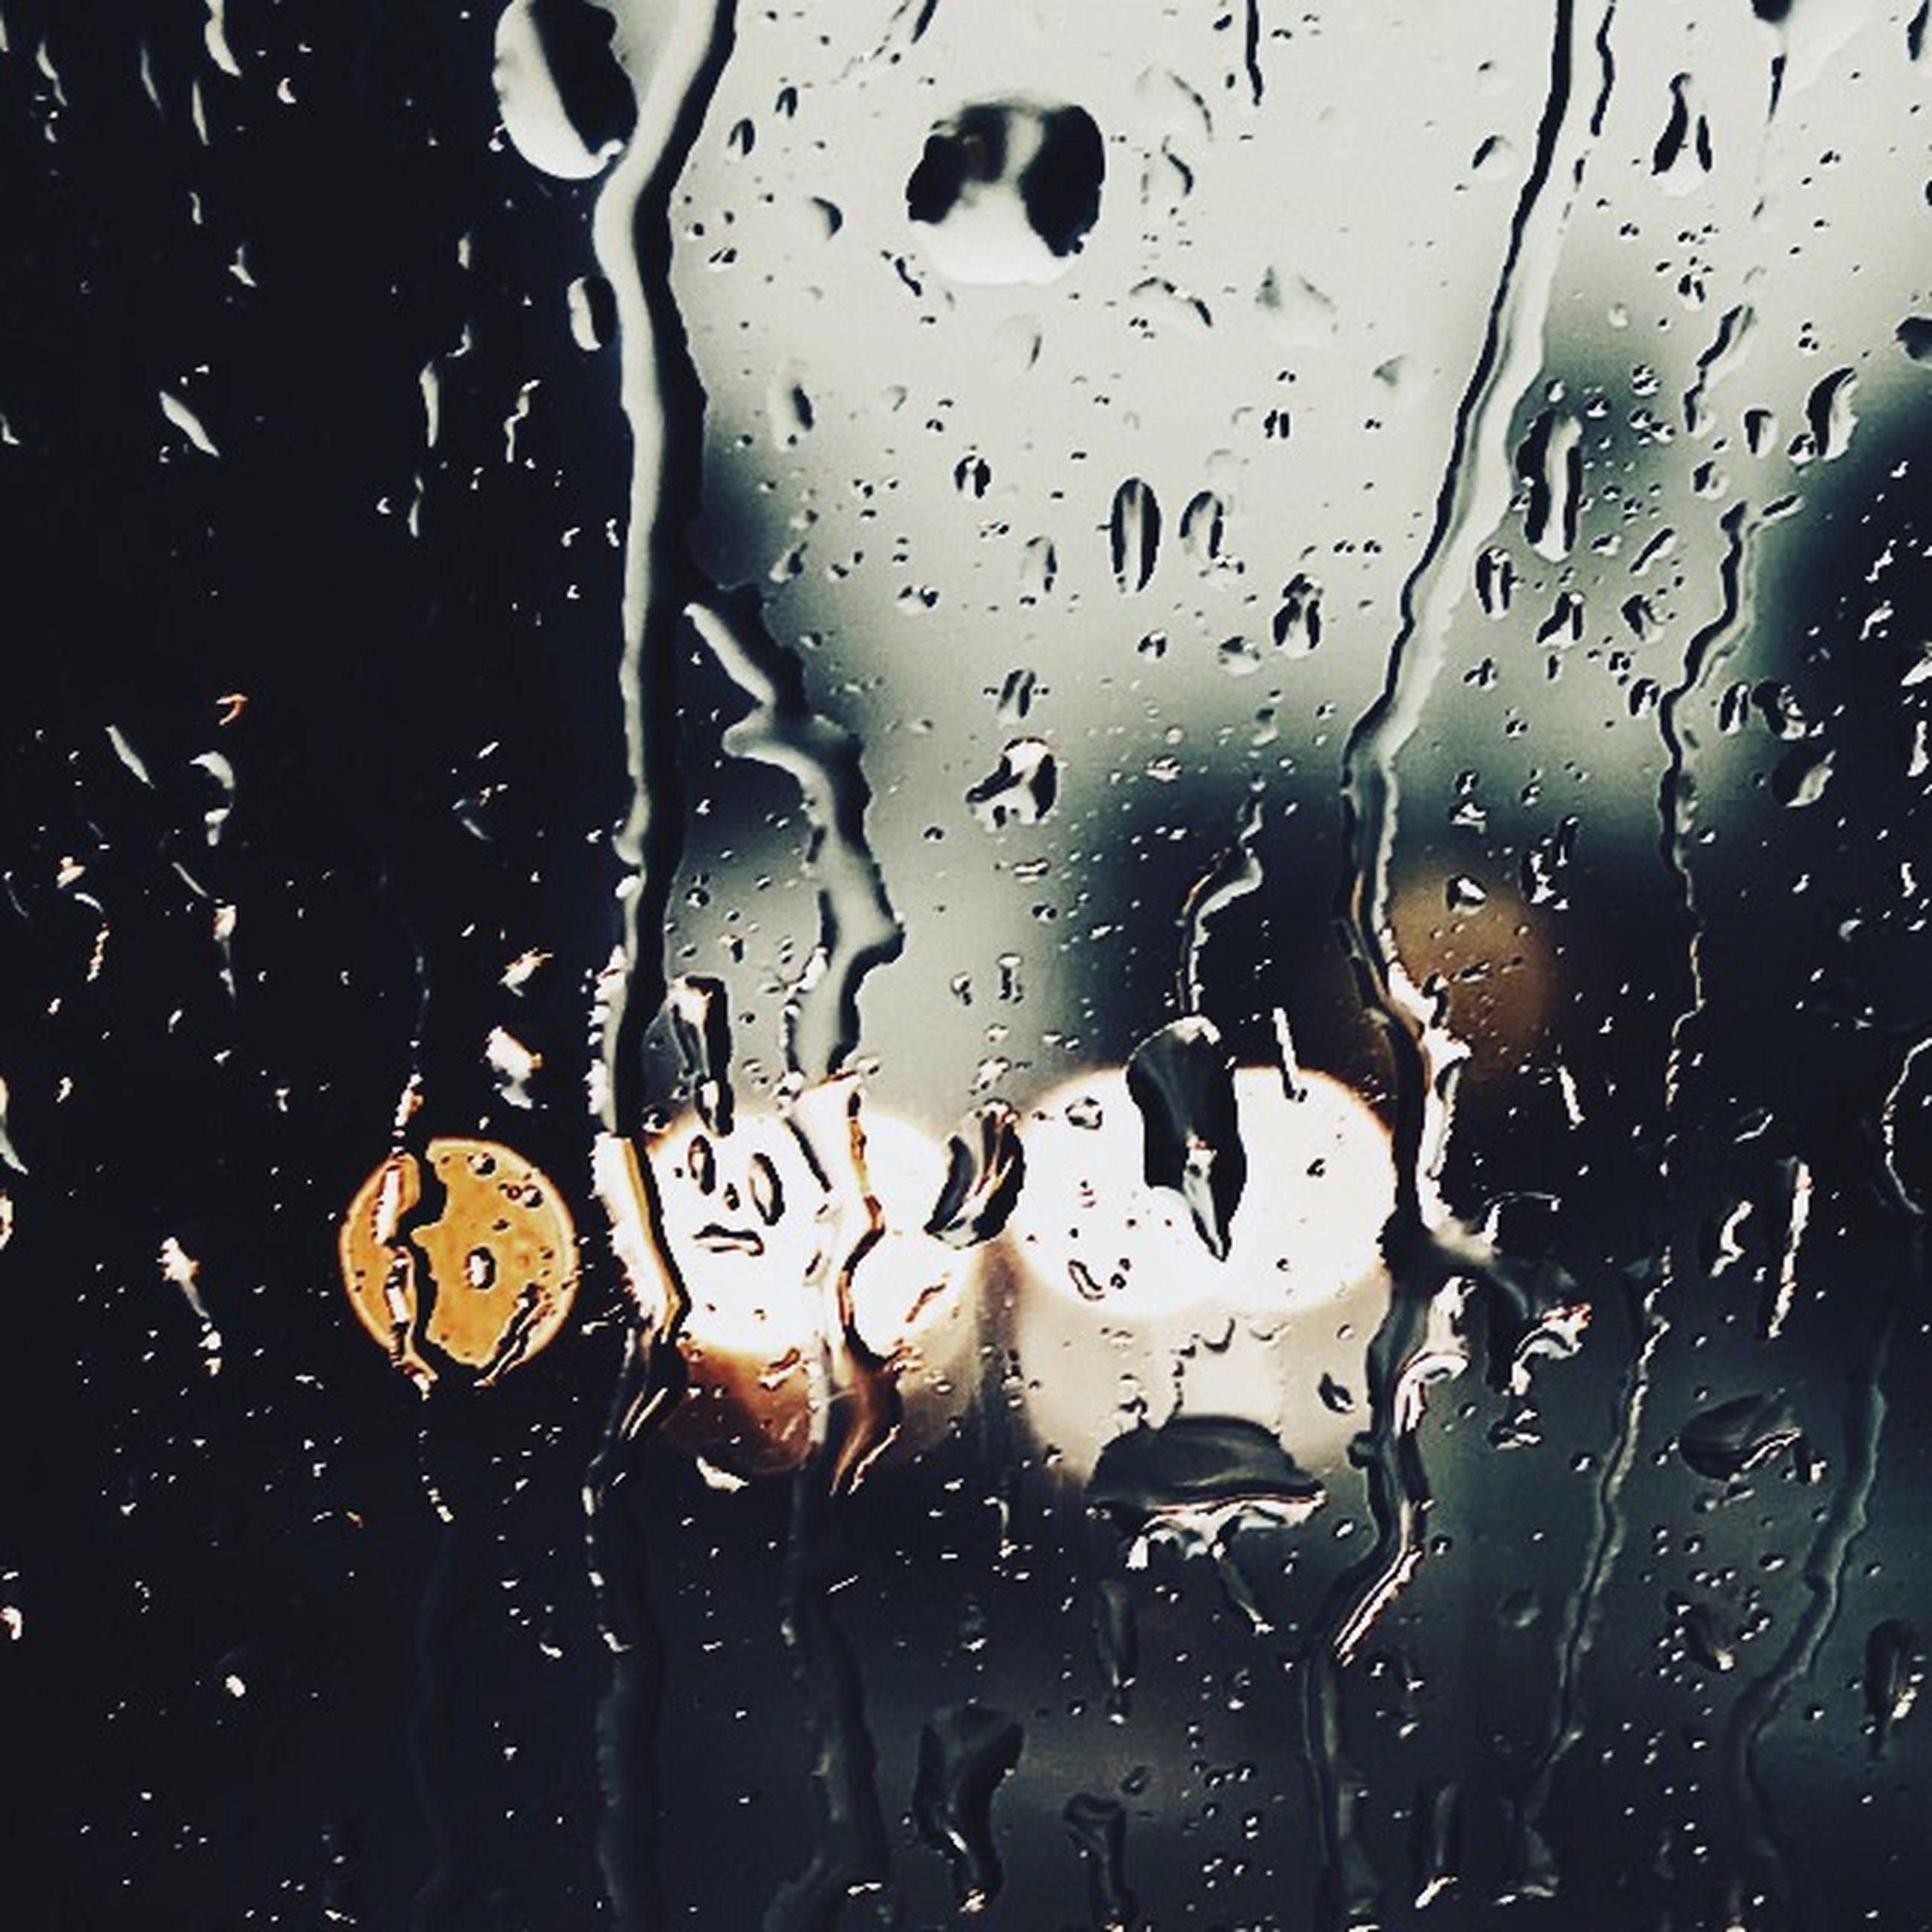 wet, drop, window, indoors, rain, glass - material, transparent, water, raindrop, full frame, backgrounds, weather, transportation, season, car, vehicle interior, land vehicle, mode of transport, glass, windshield